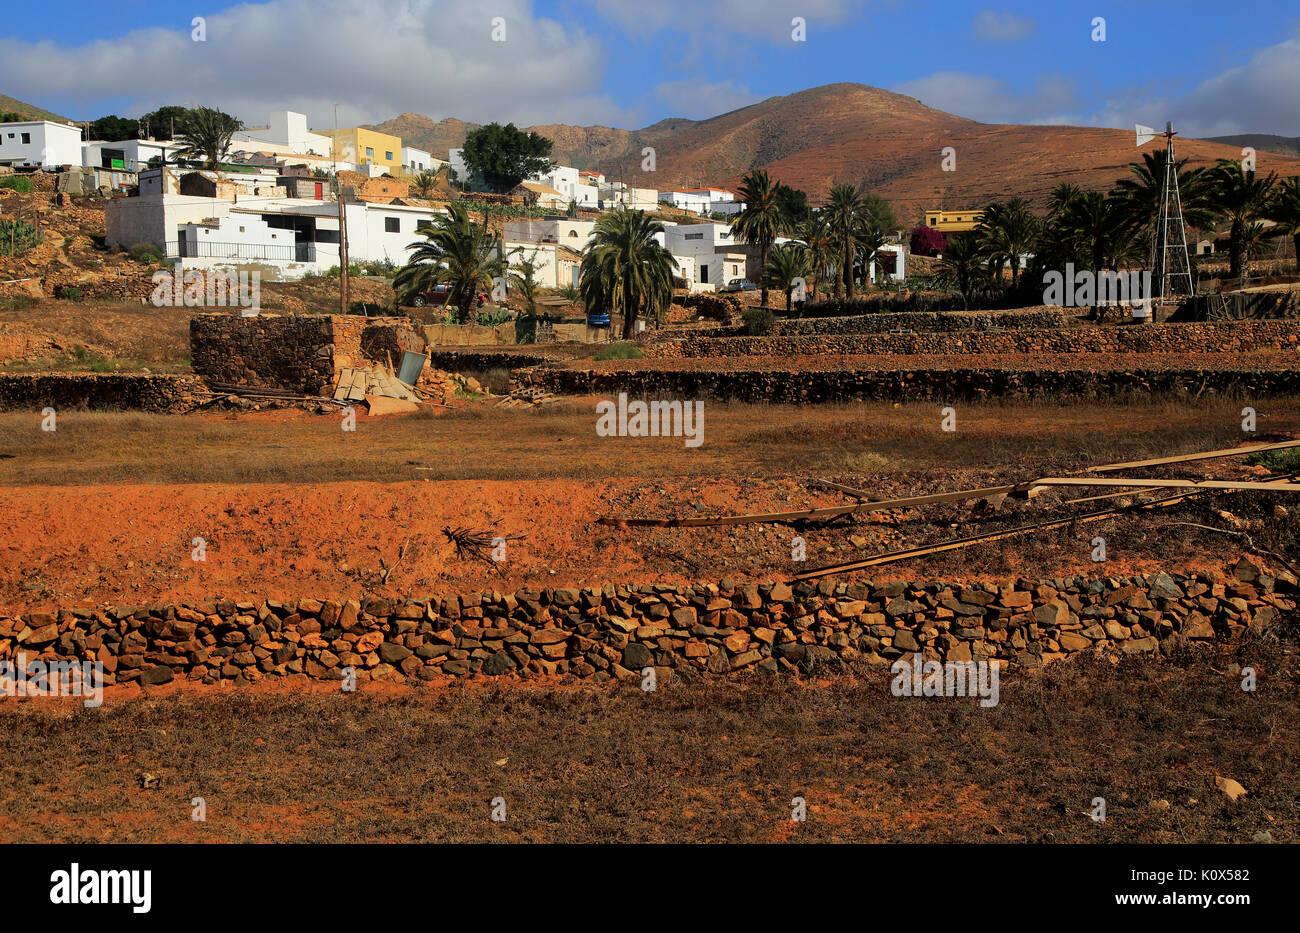 Village Toto In Fuerteventura Stock Photos & Village Toto In ...